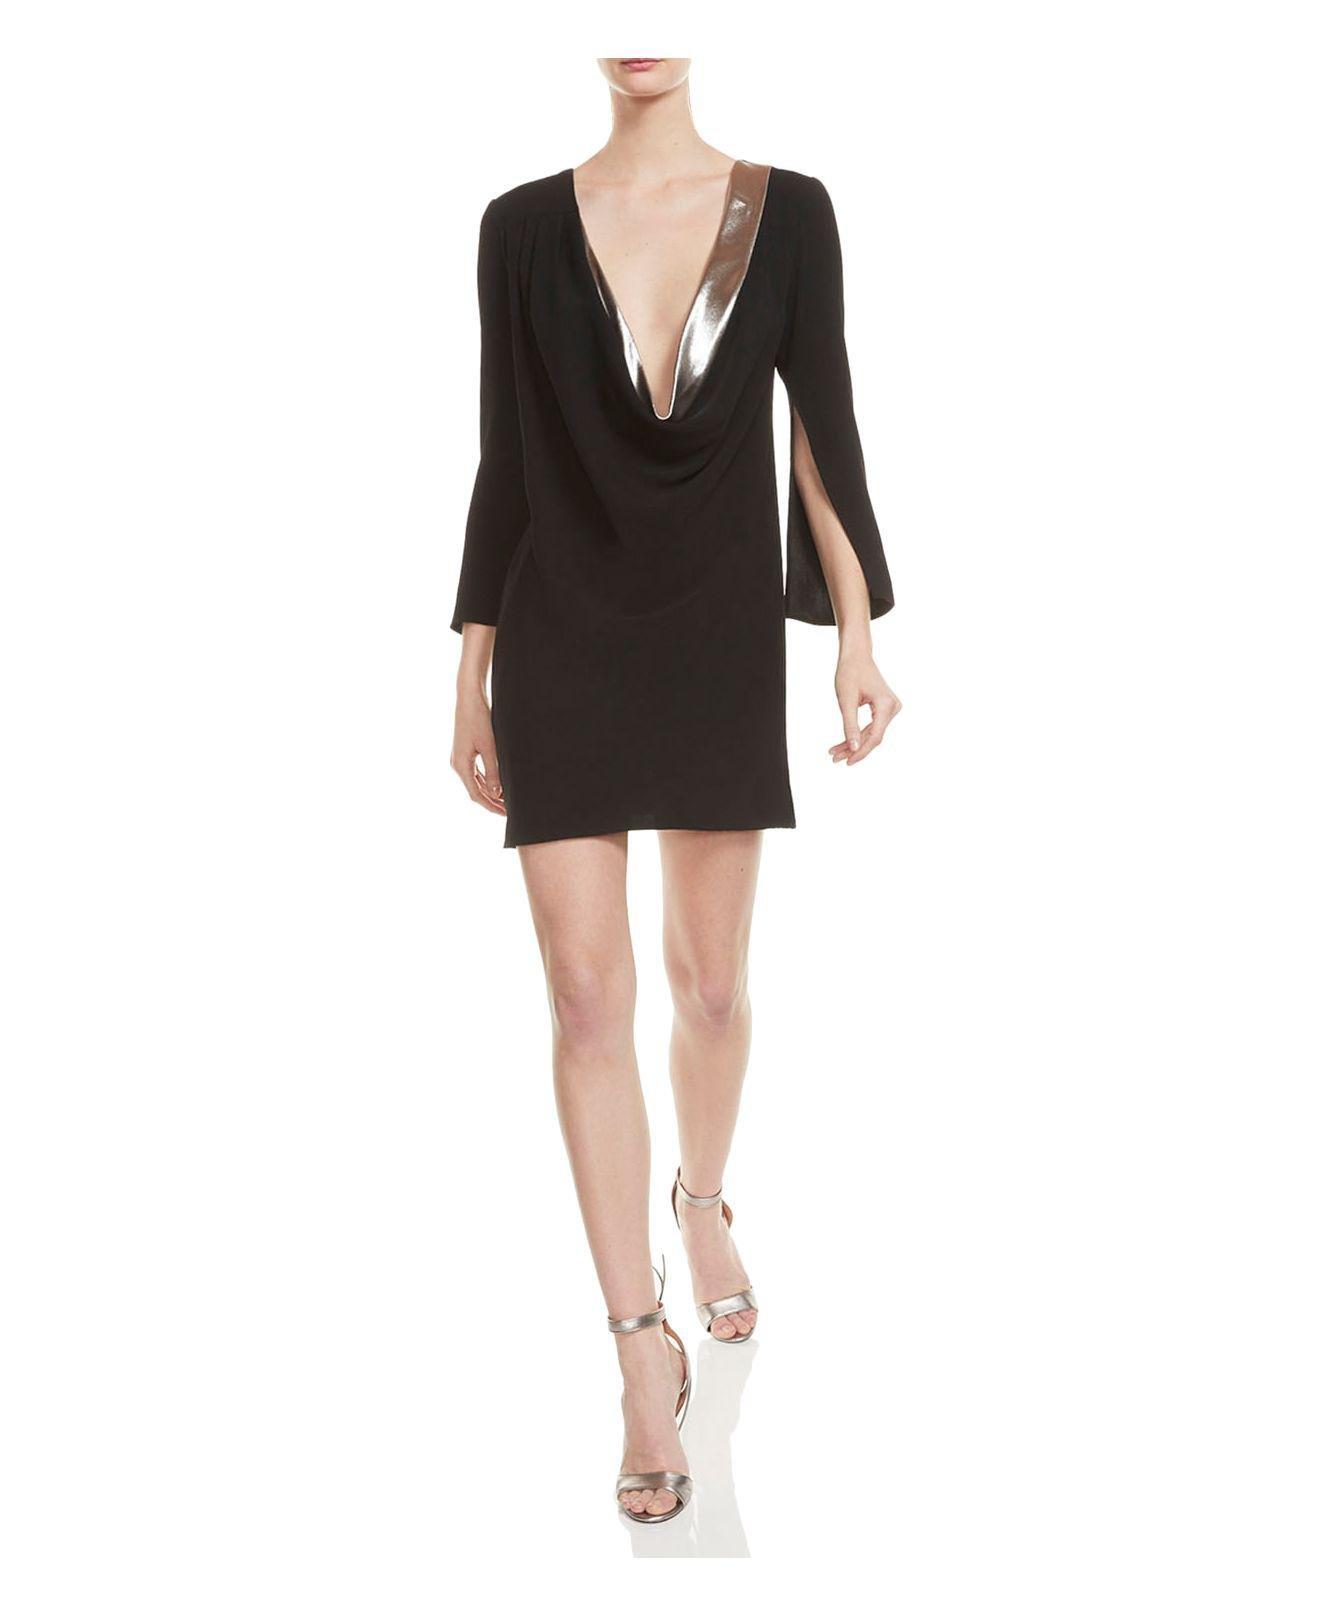 Halston Heritage Womens Fit & Flare A-Line Dress | Selena ...